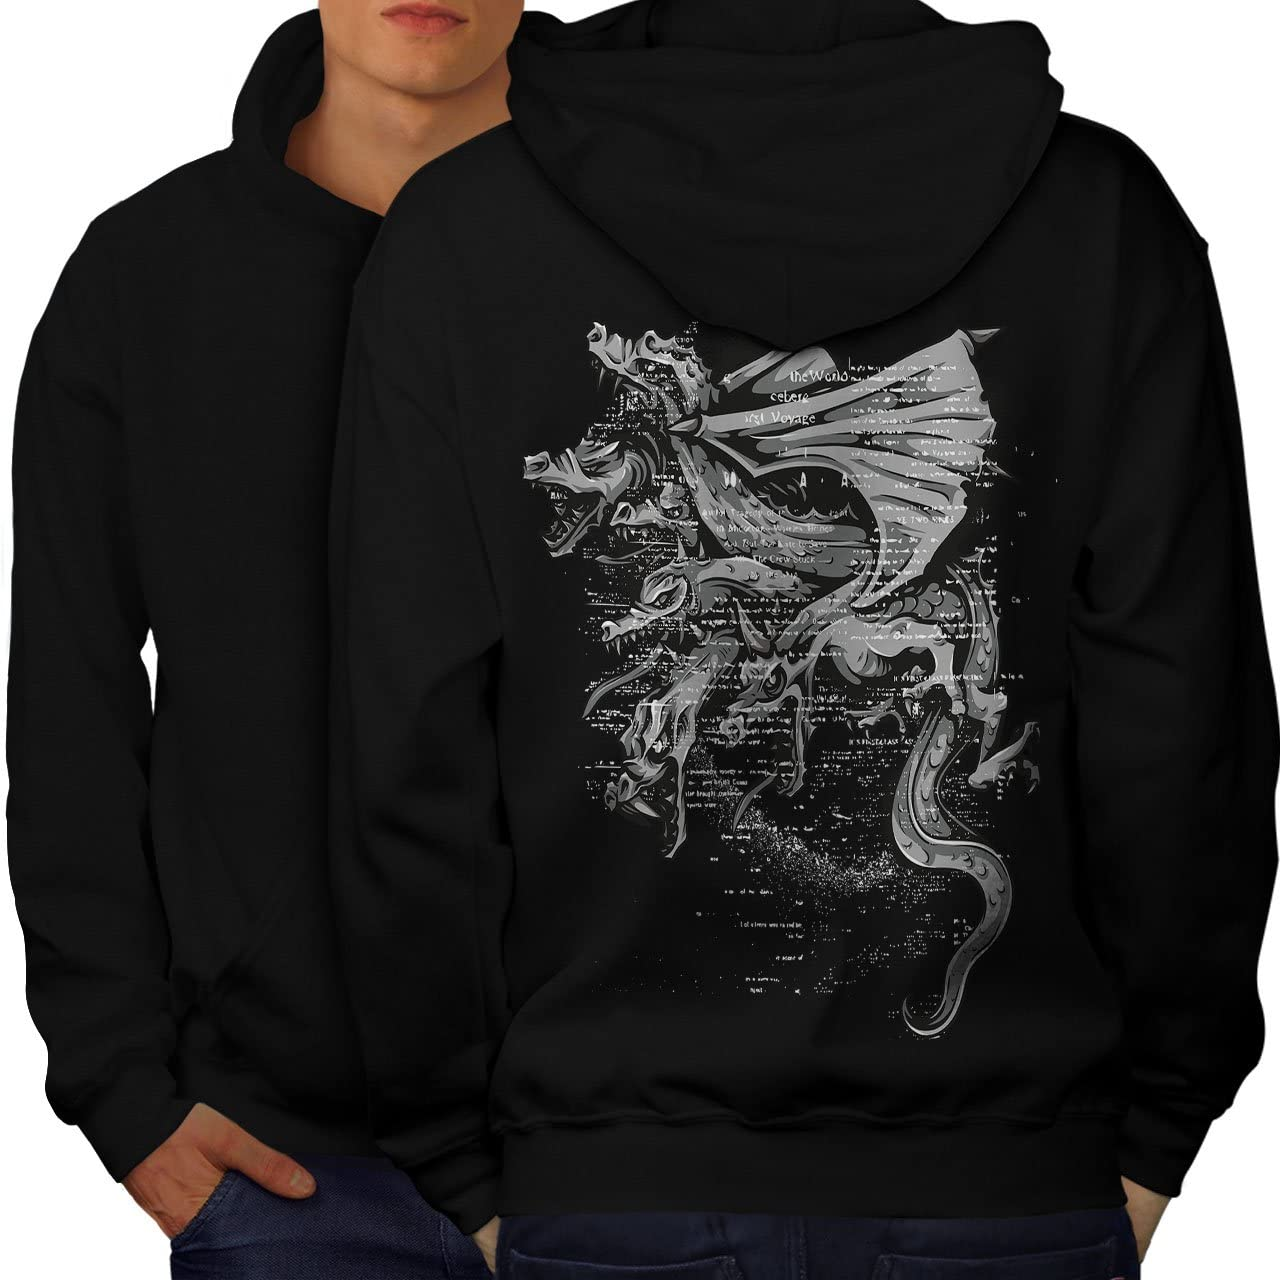 Wellcoda Dragon Gang Mob Crew Mens Hoodie, Fantasy Design on The Jumpers Back